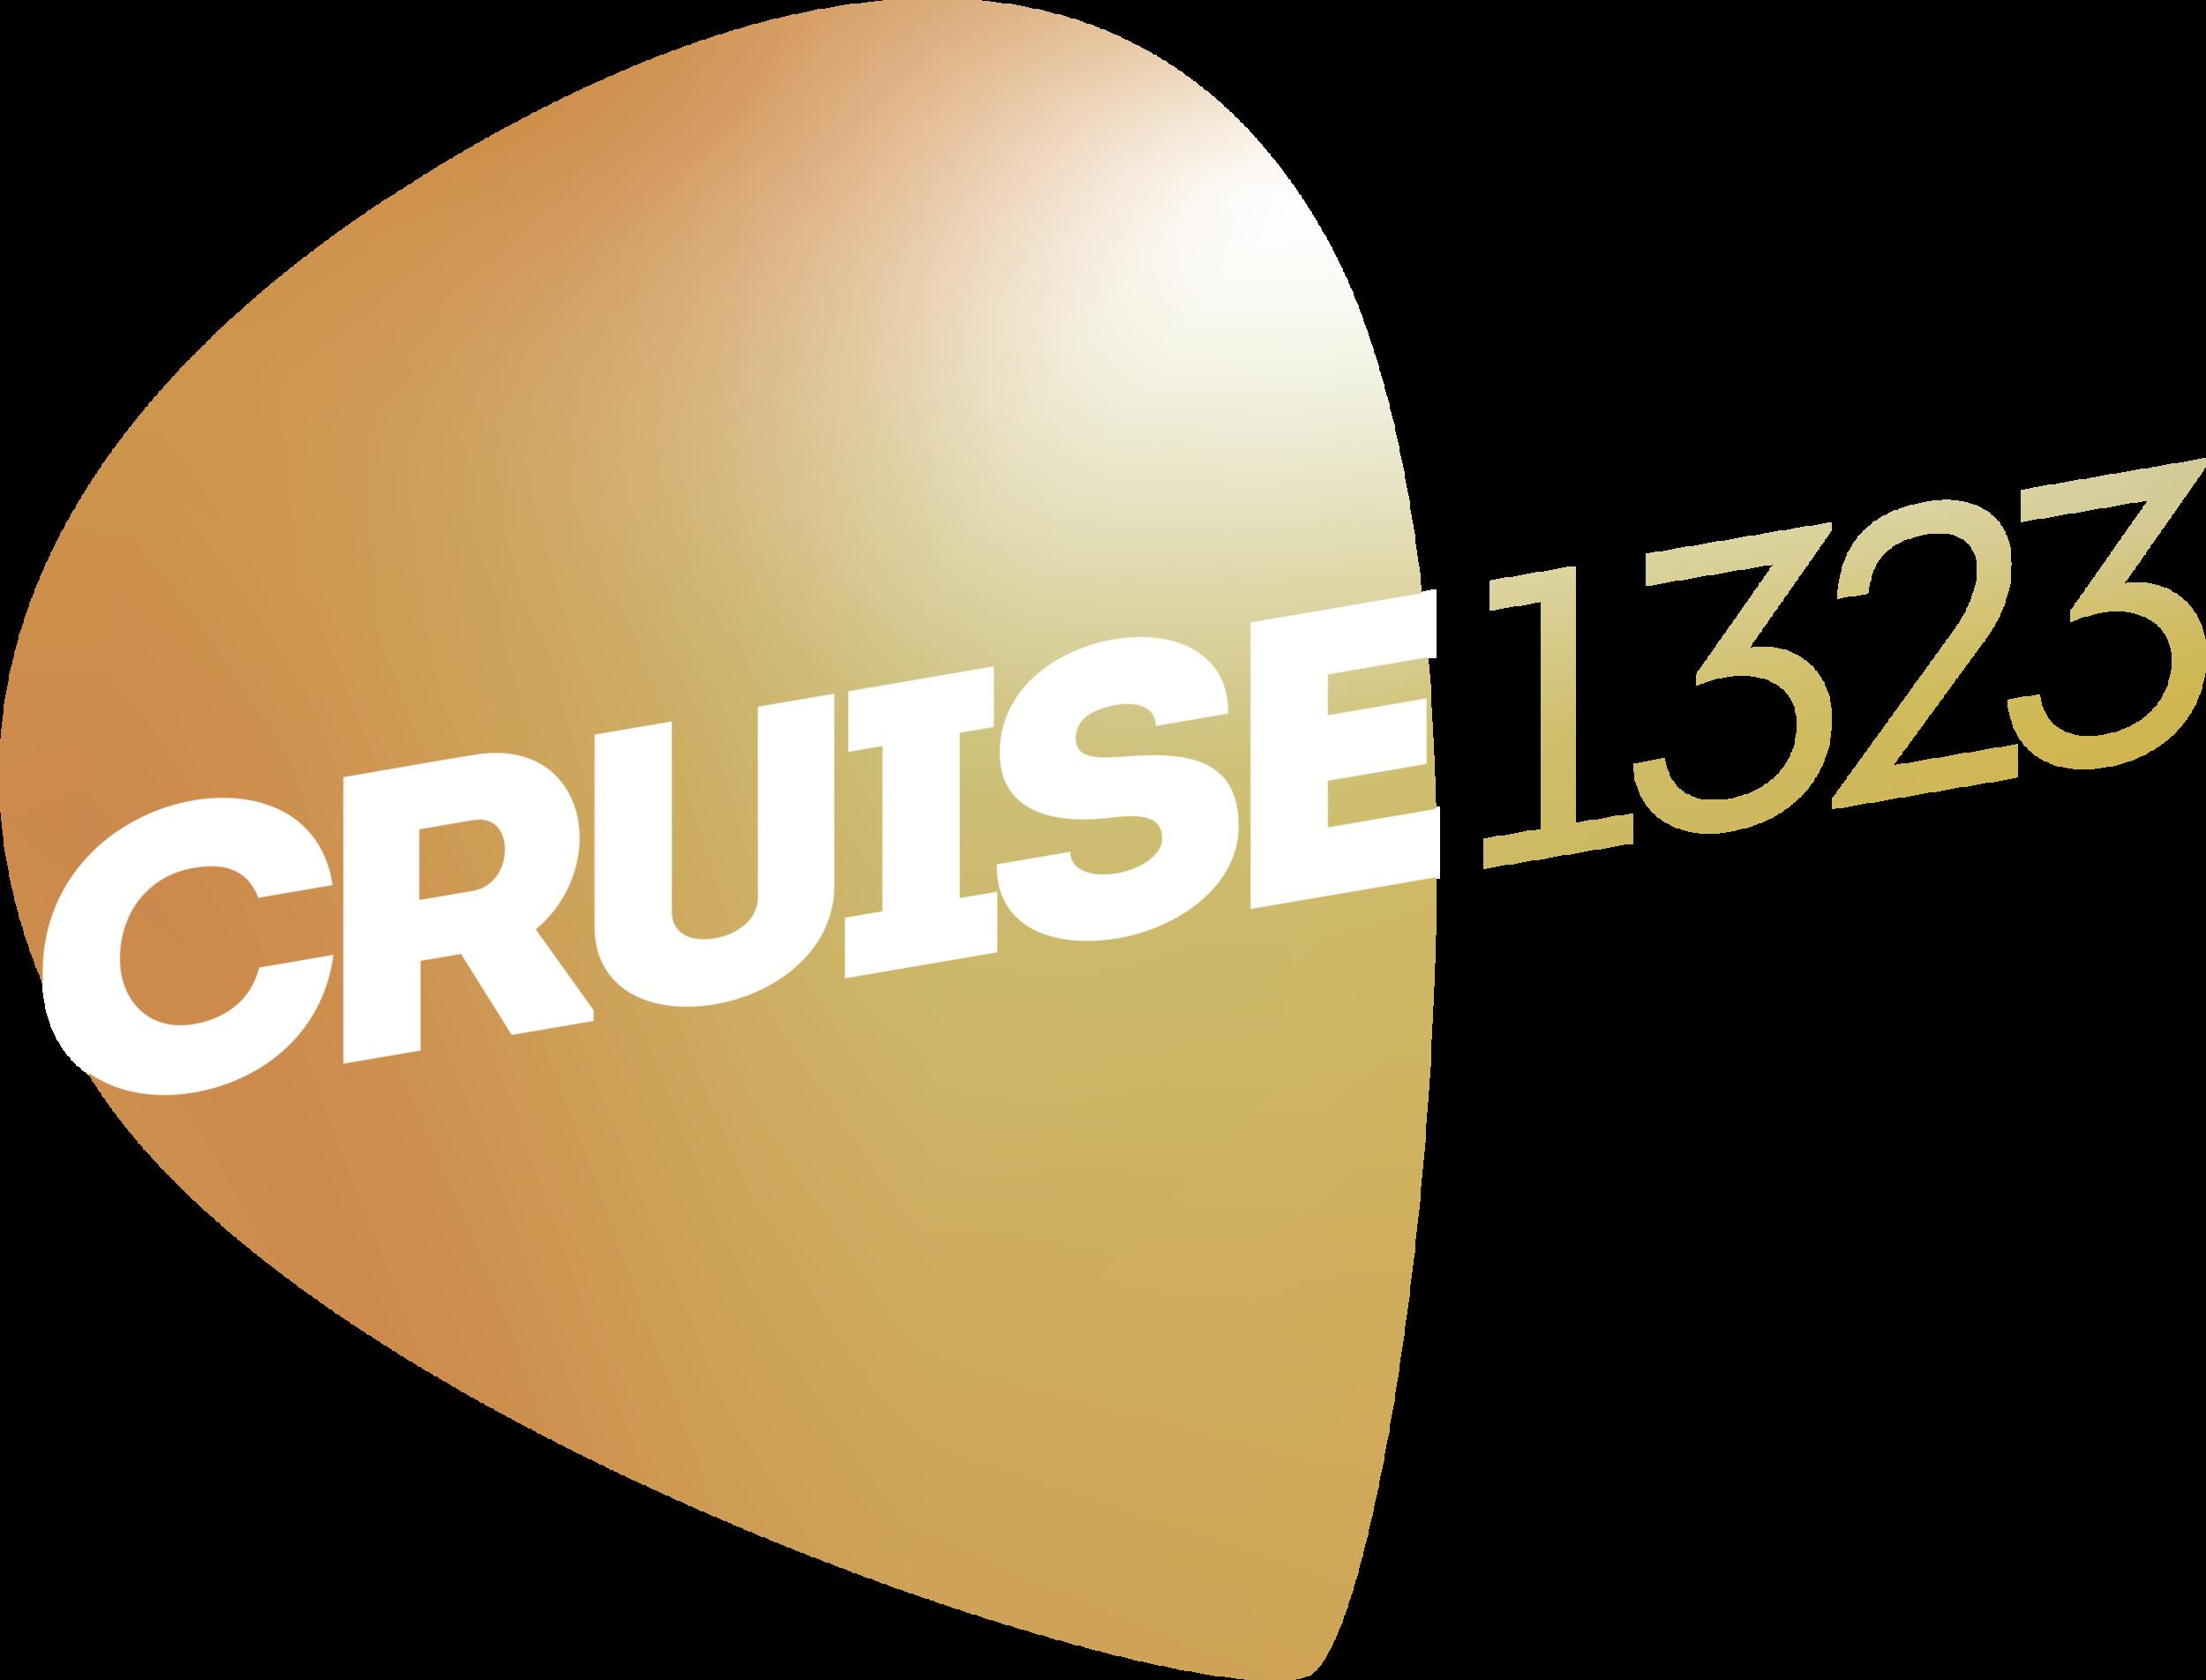 Cruise_CMYK_NO_TAG.PNG